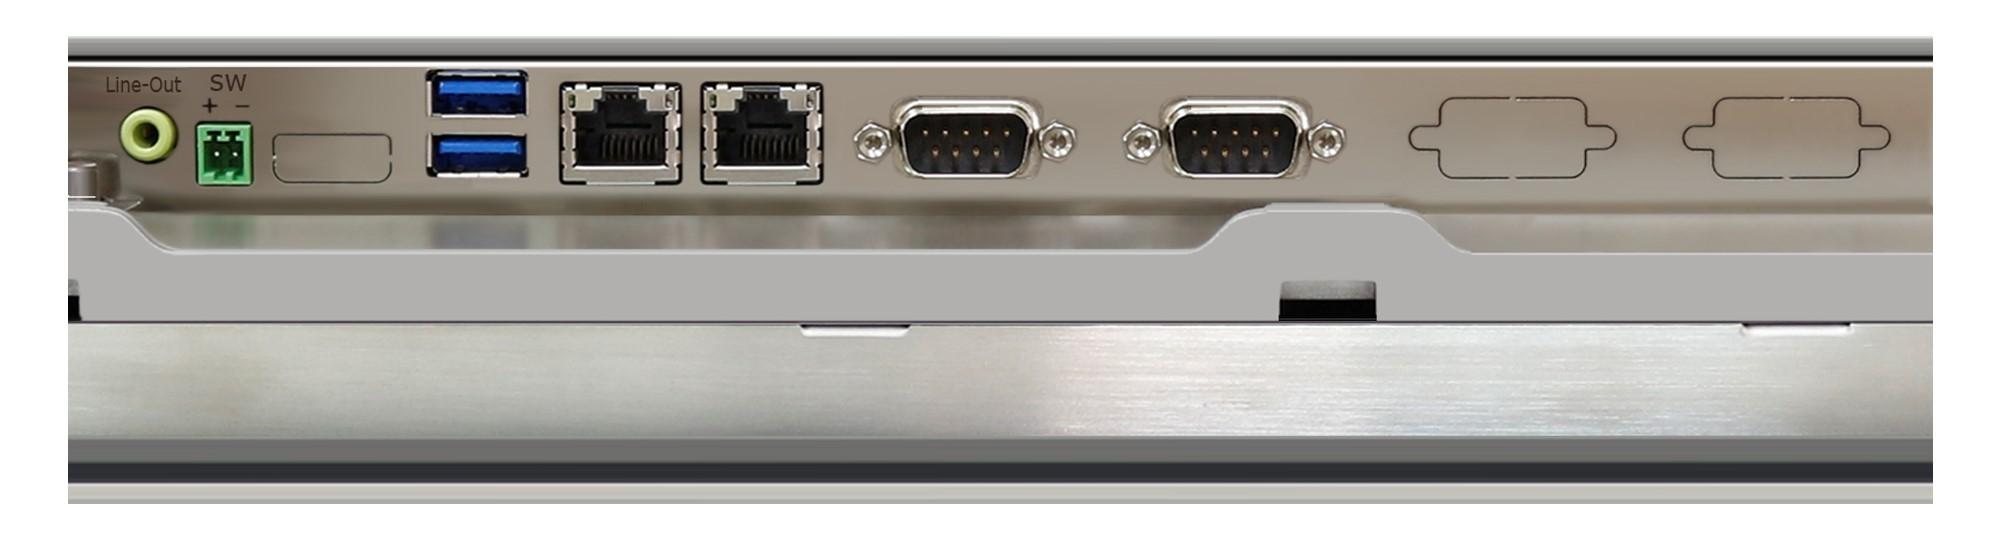 TSP-2945 Industrial Panel PC IOs